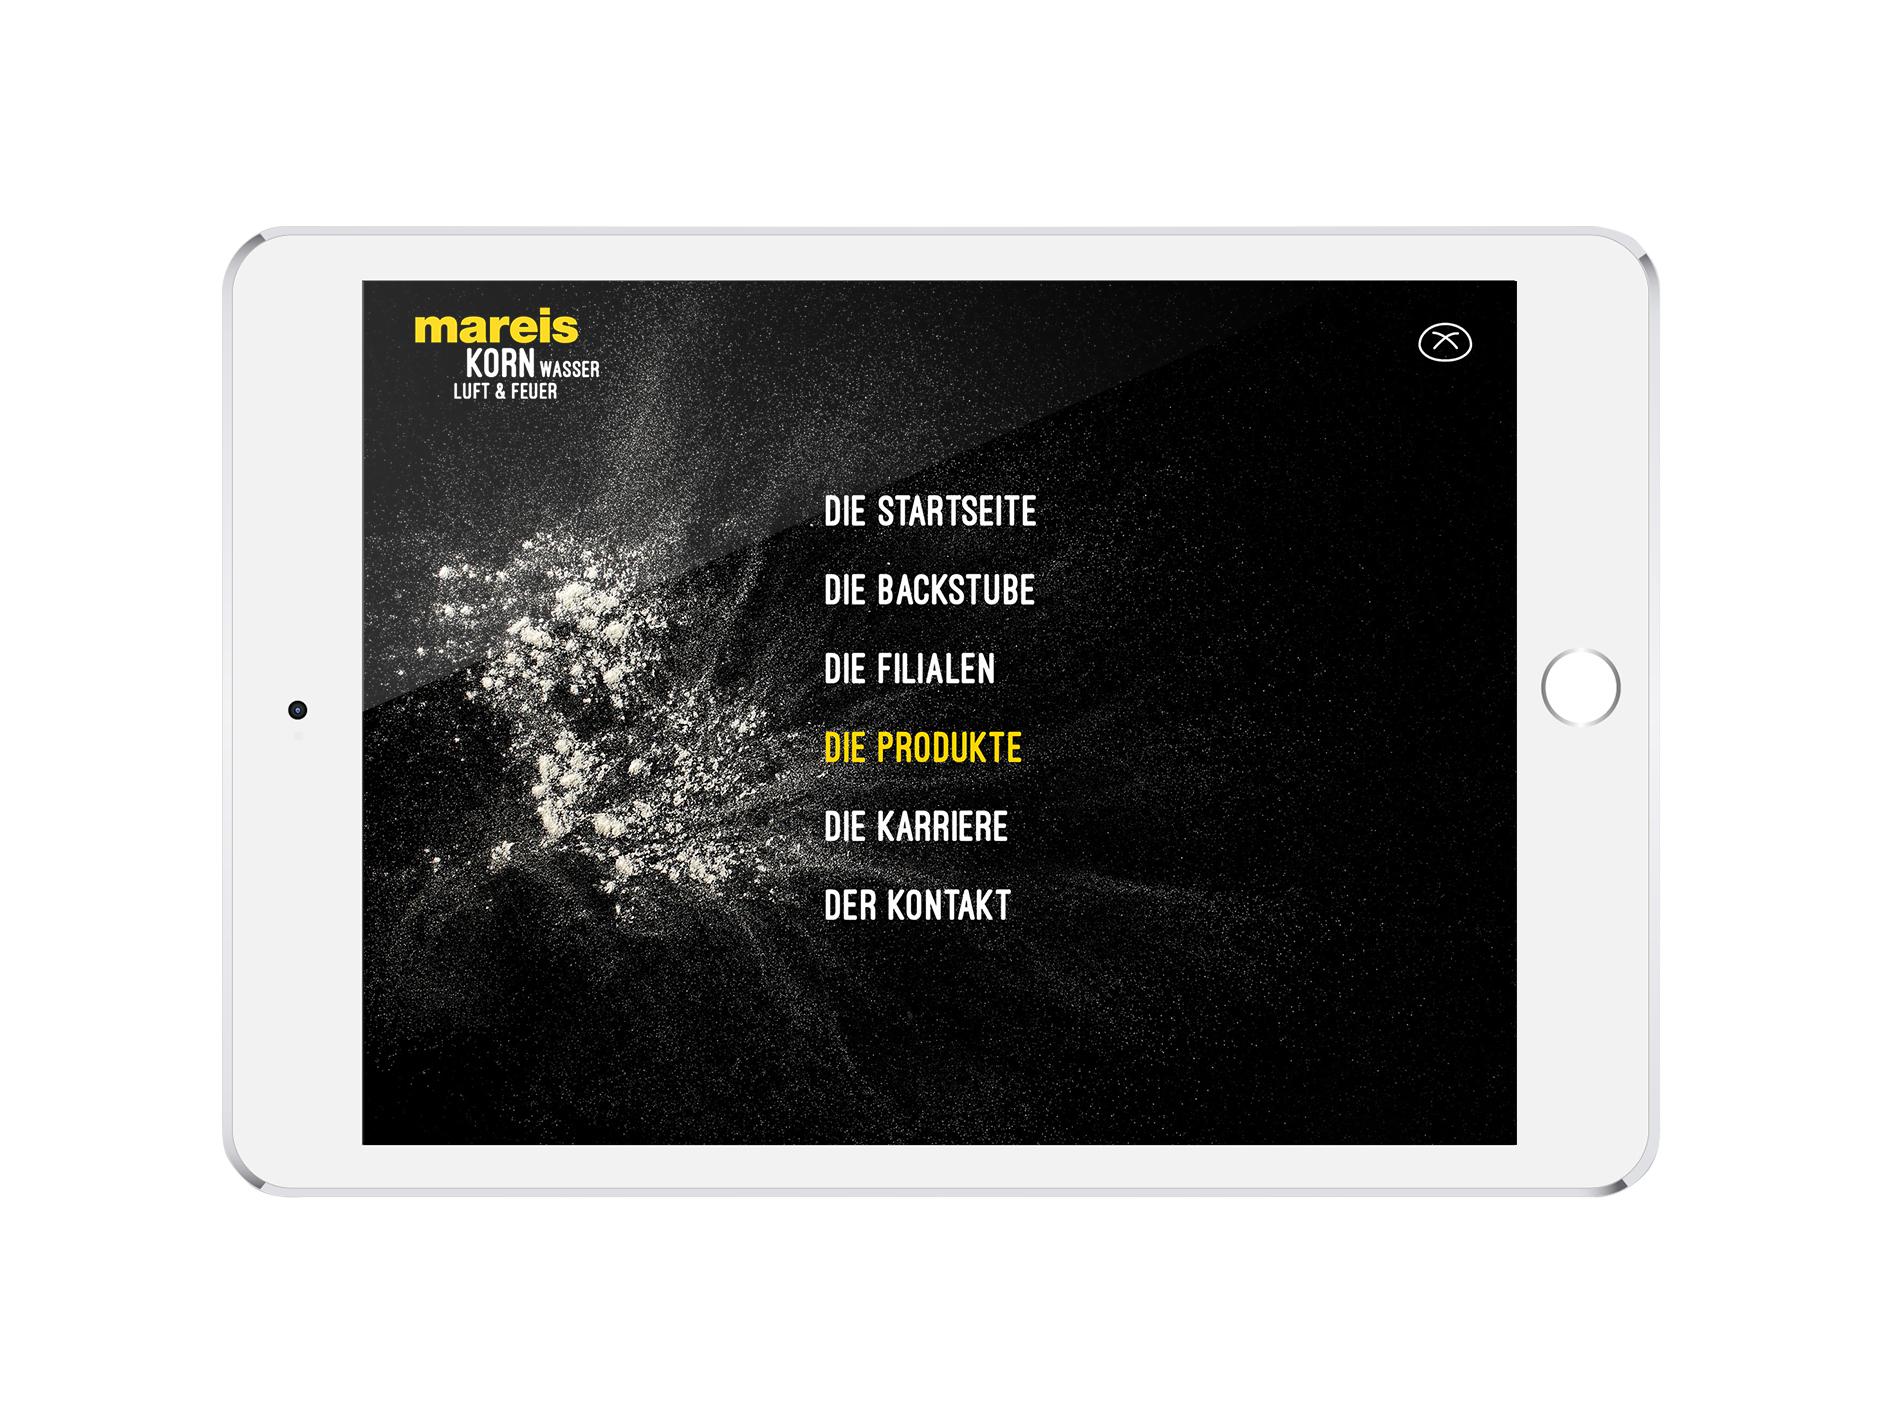 ipad_quer_mareis_menu